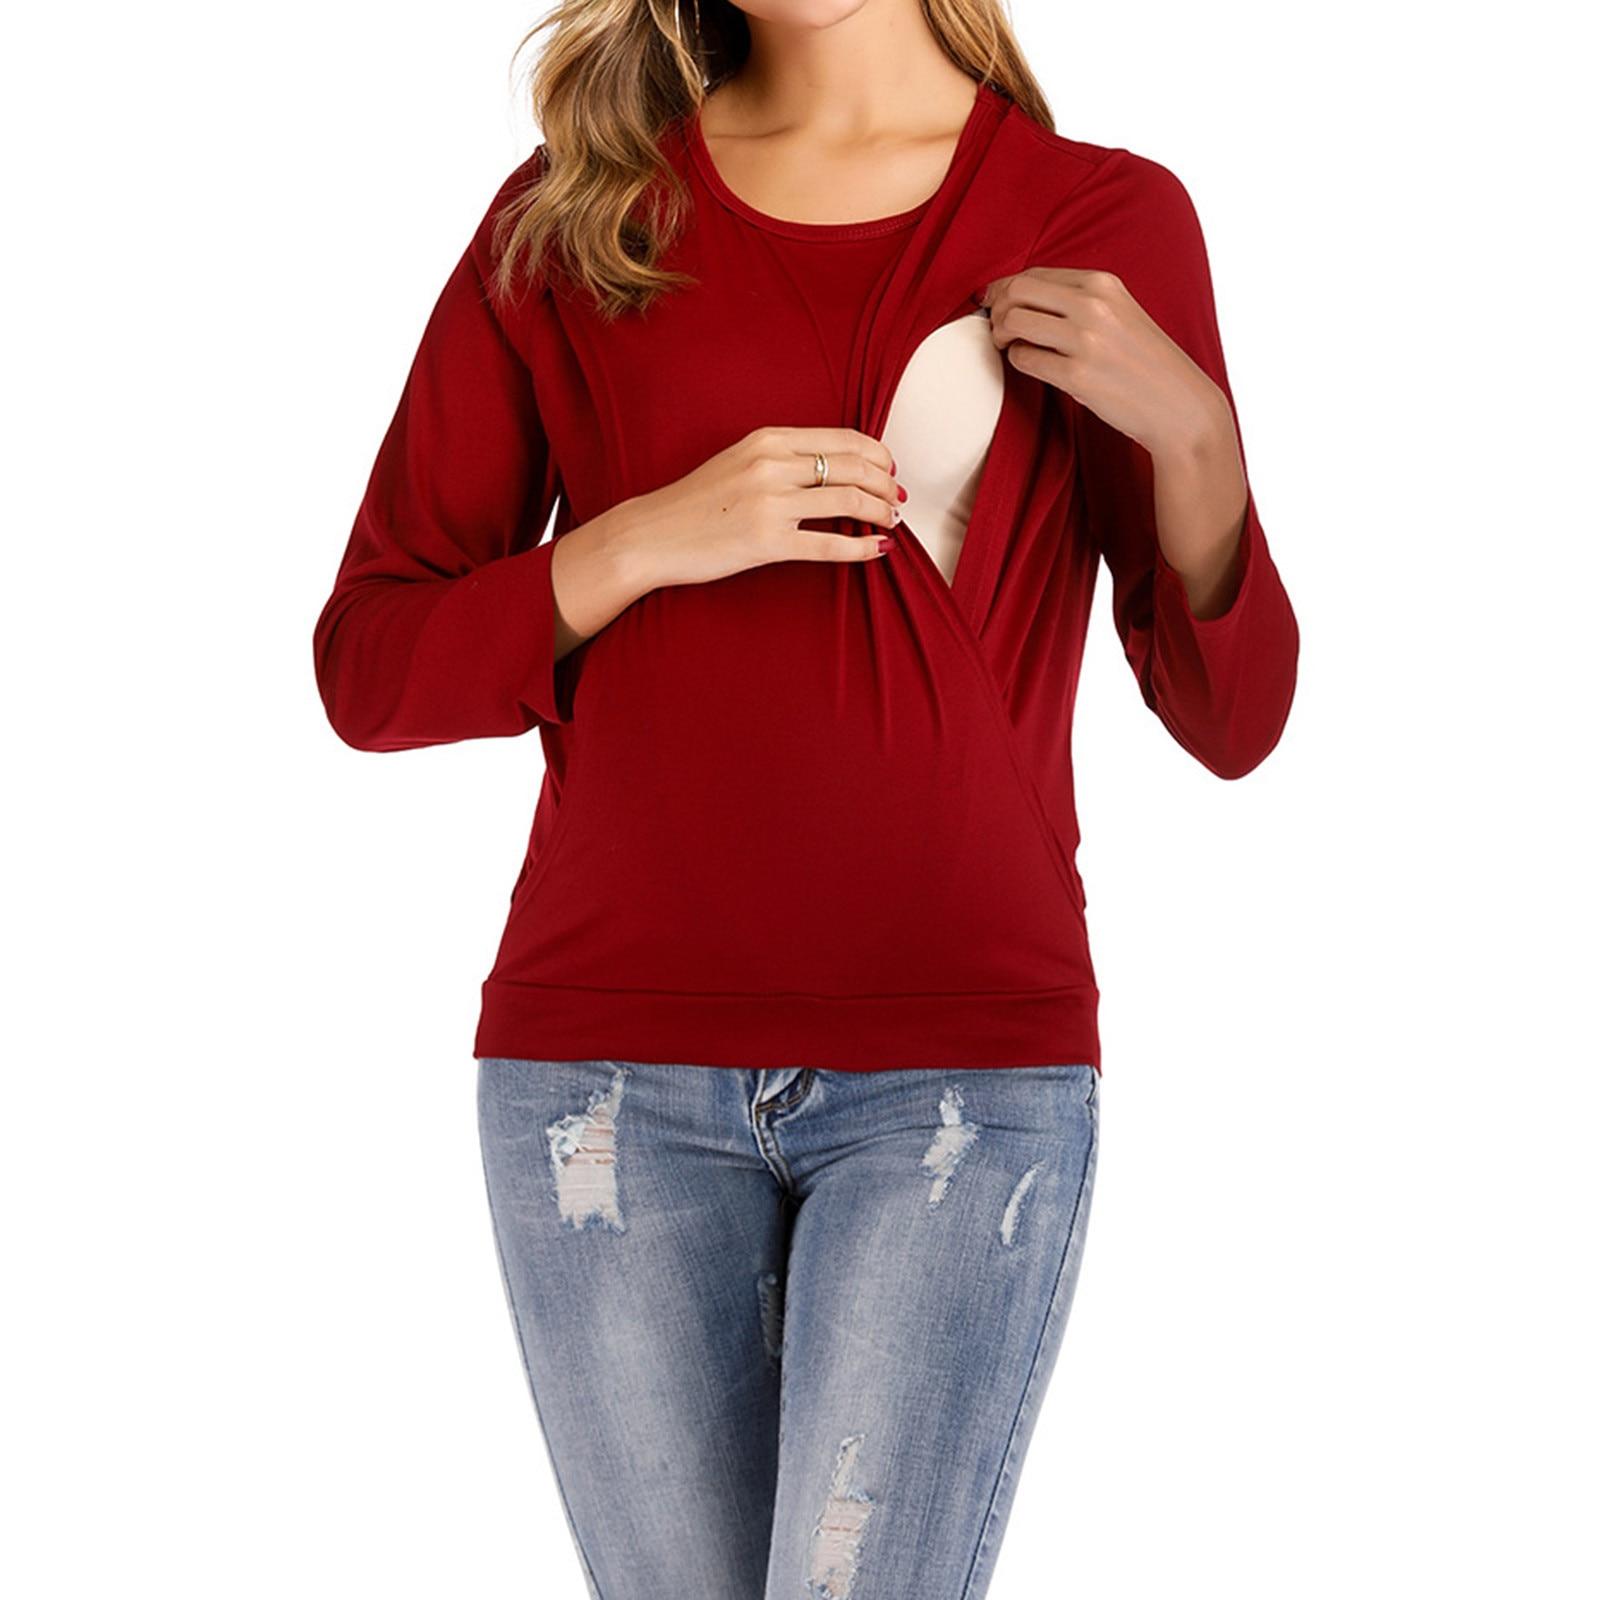 Maternity Wear Long Sleeve Spring And Autumn Fashion Round Neck Maternity Wear Long Sleeve Nursing Top Xl S-Xxxl Zwanger F4